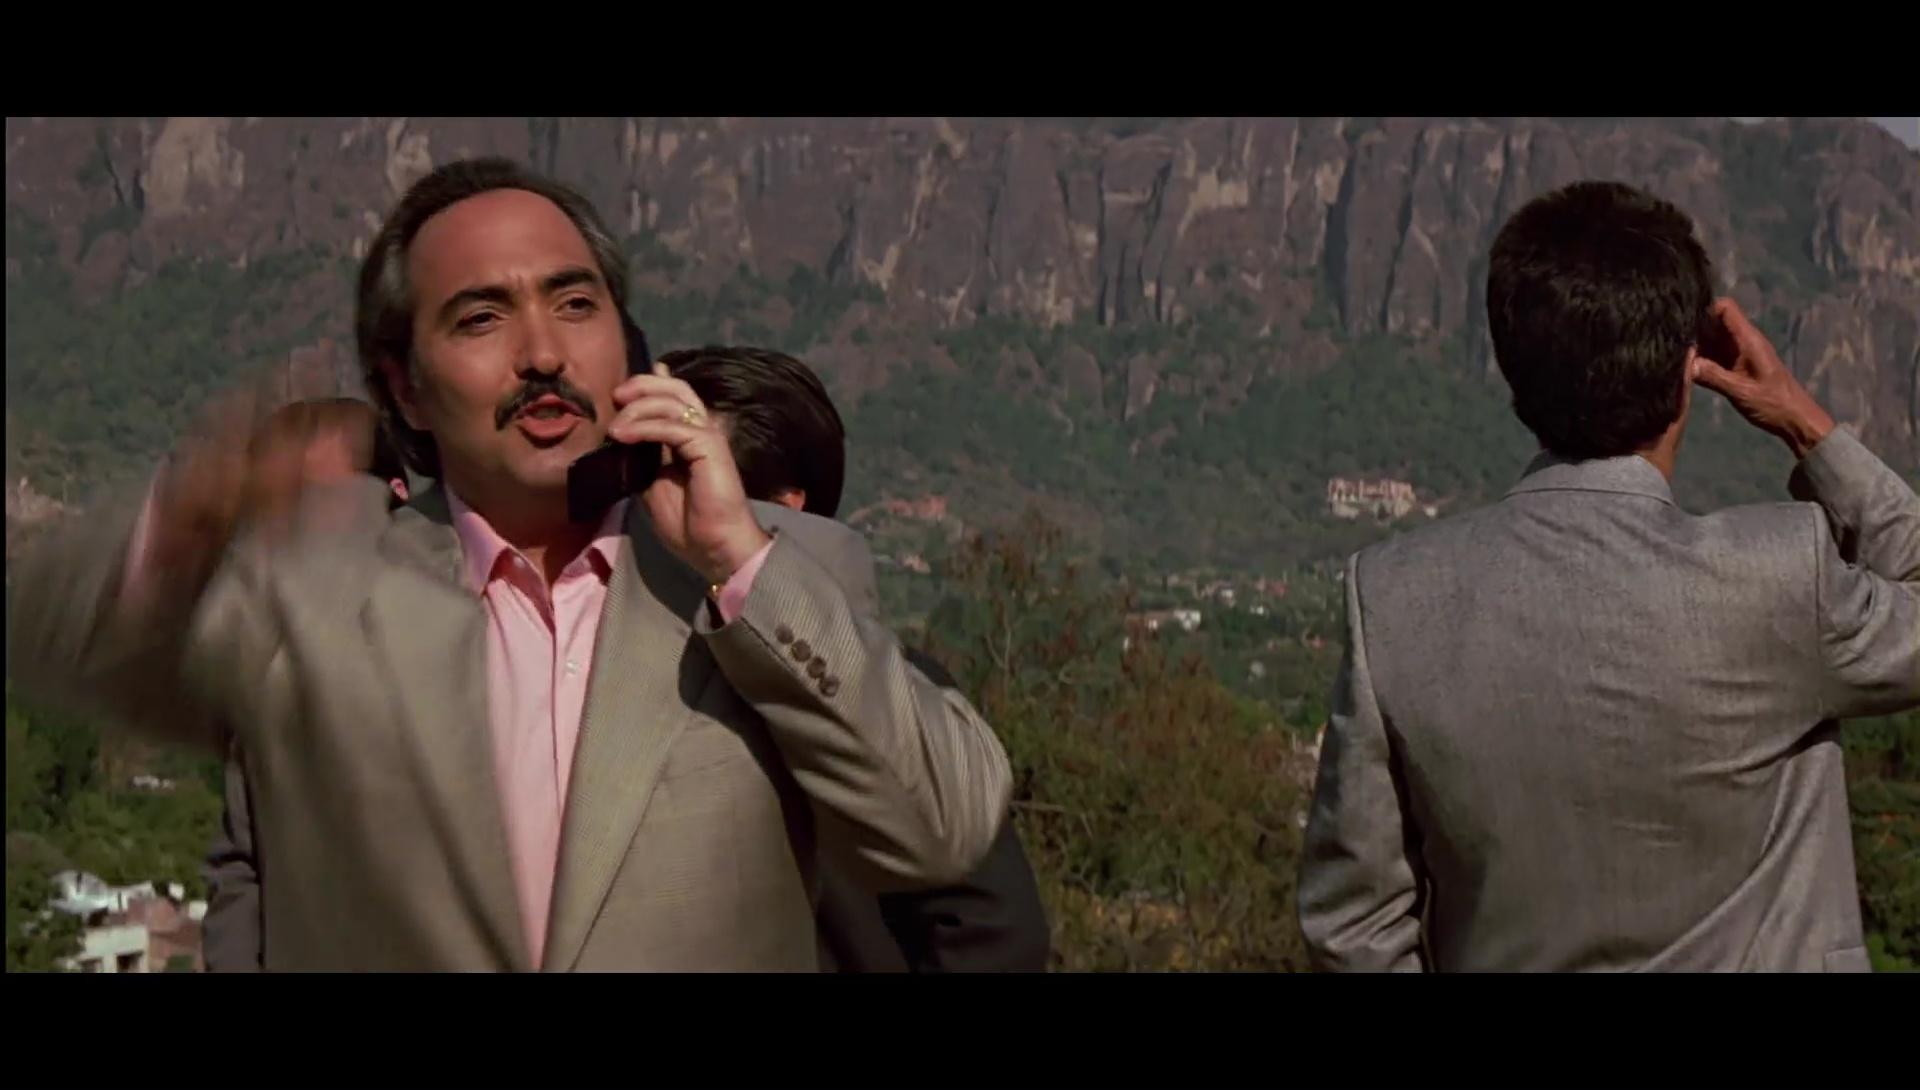 Peligro Inminente 1080p Lat-Cast-Ing 5.1 (1994)